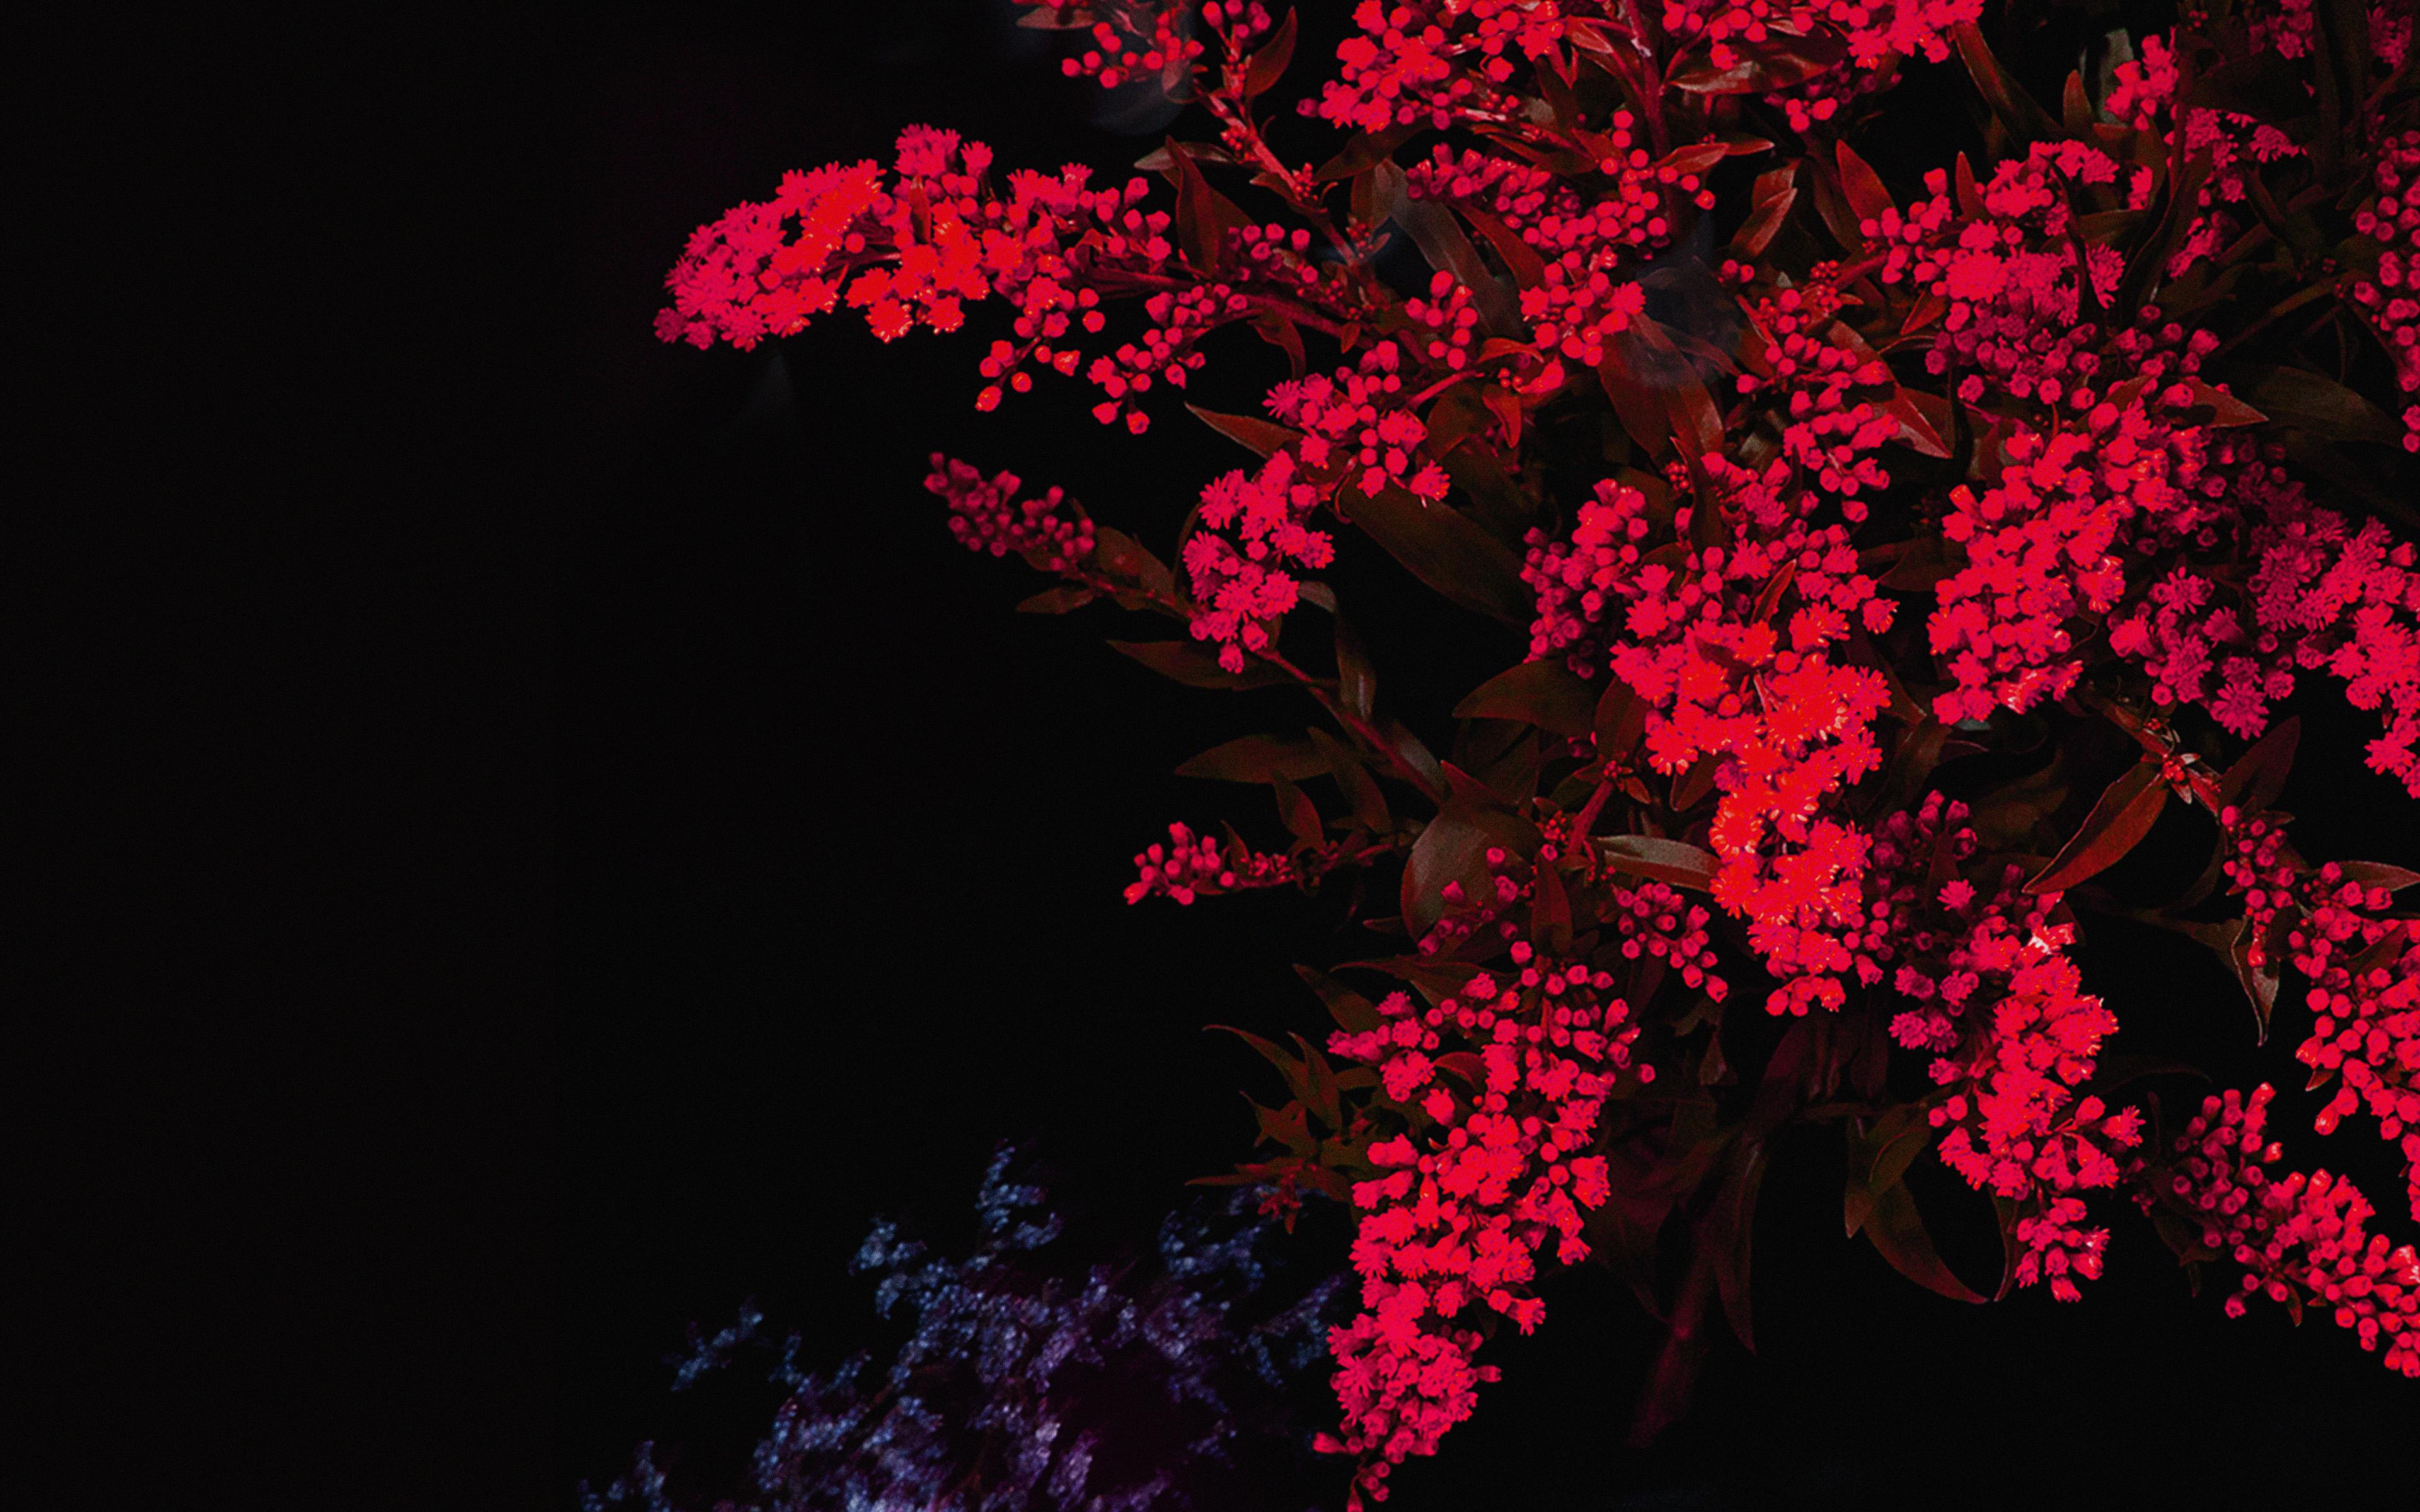 Desktoppapers Co An59 Apple Red Flower Dark Ios9 Iphone6s